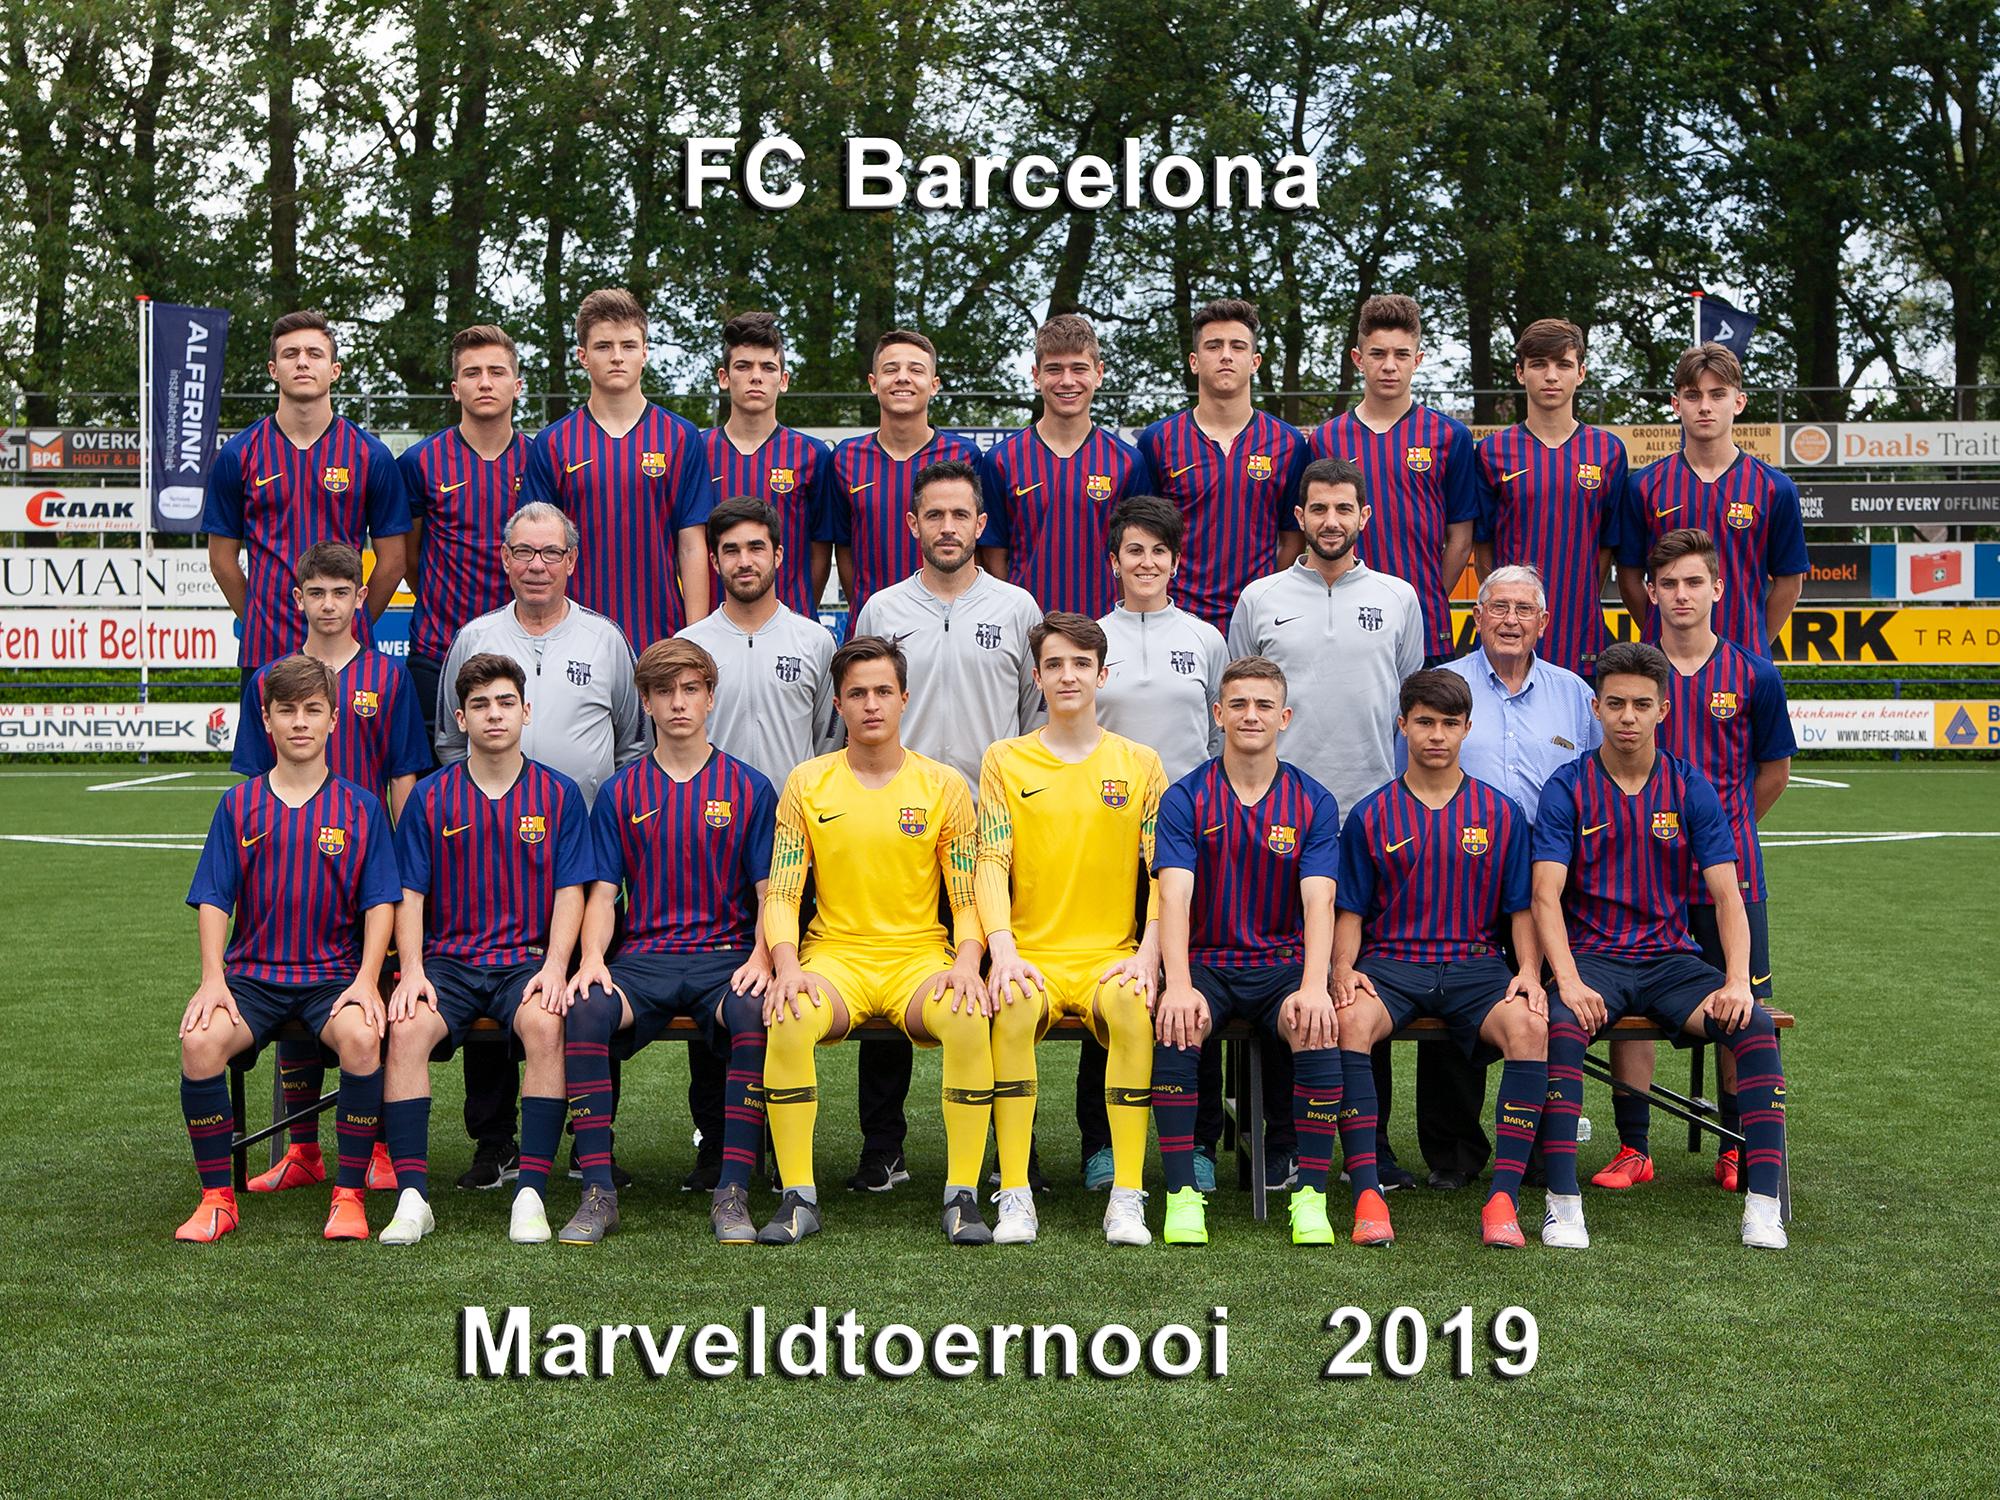 Marveld Tournament 2019 - Team FC Barcelona